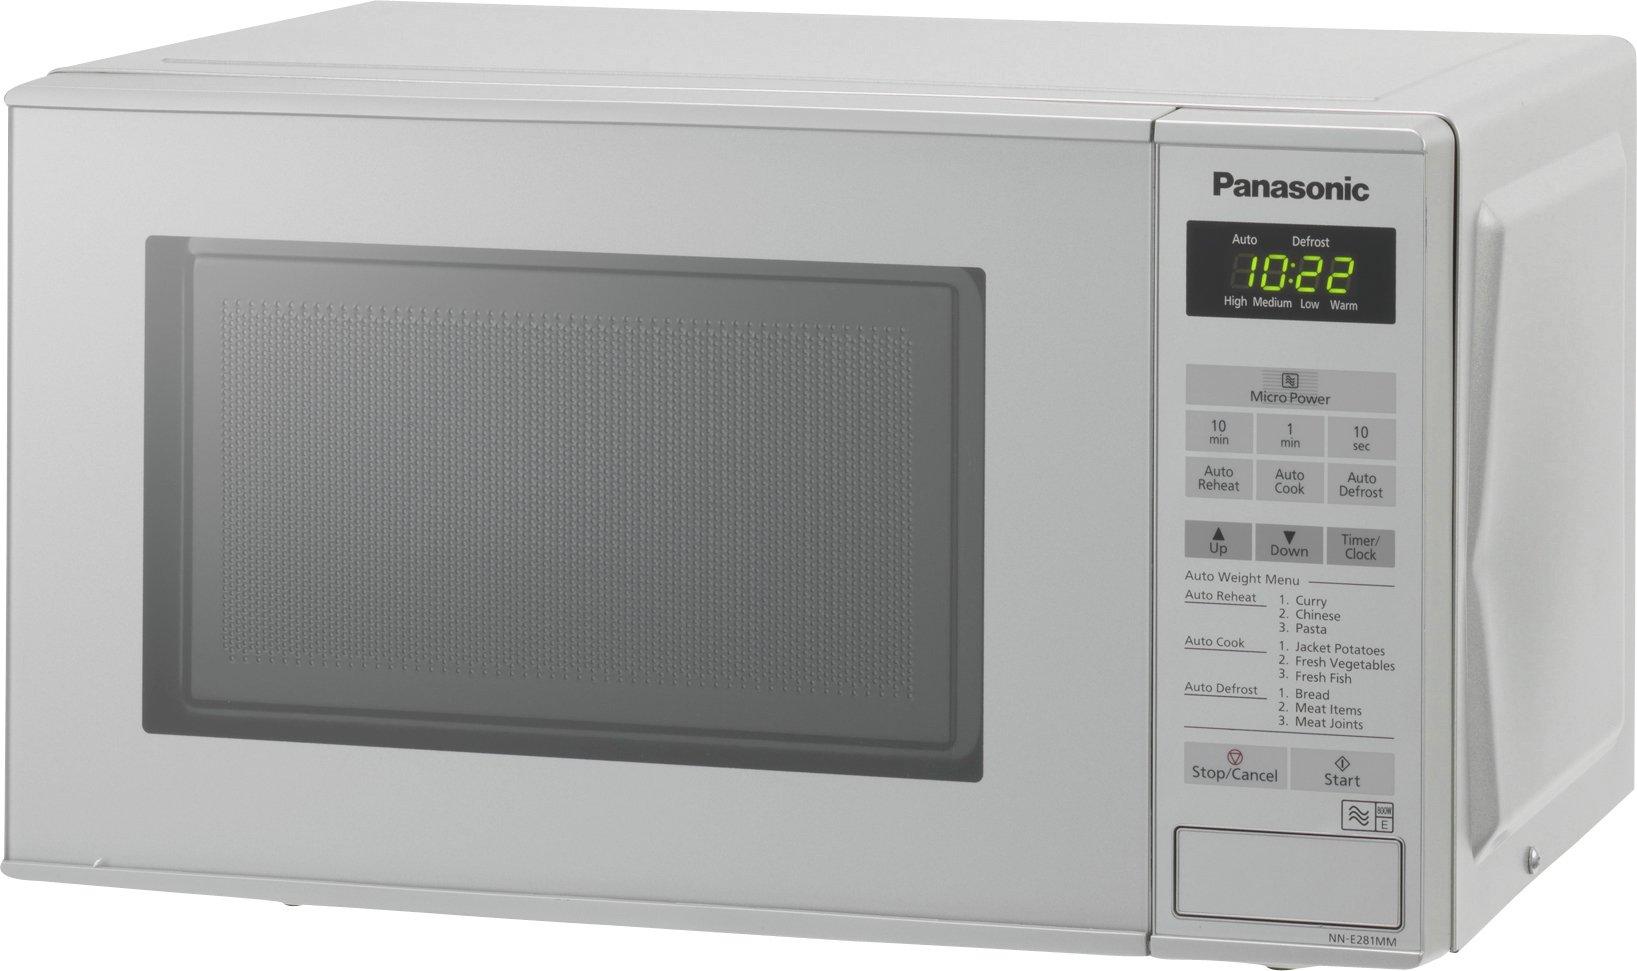 'Panasonic - Nn-e281mm 800w Standard Touch Microwave - Silver